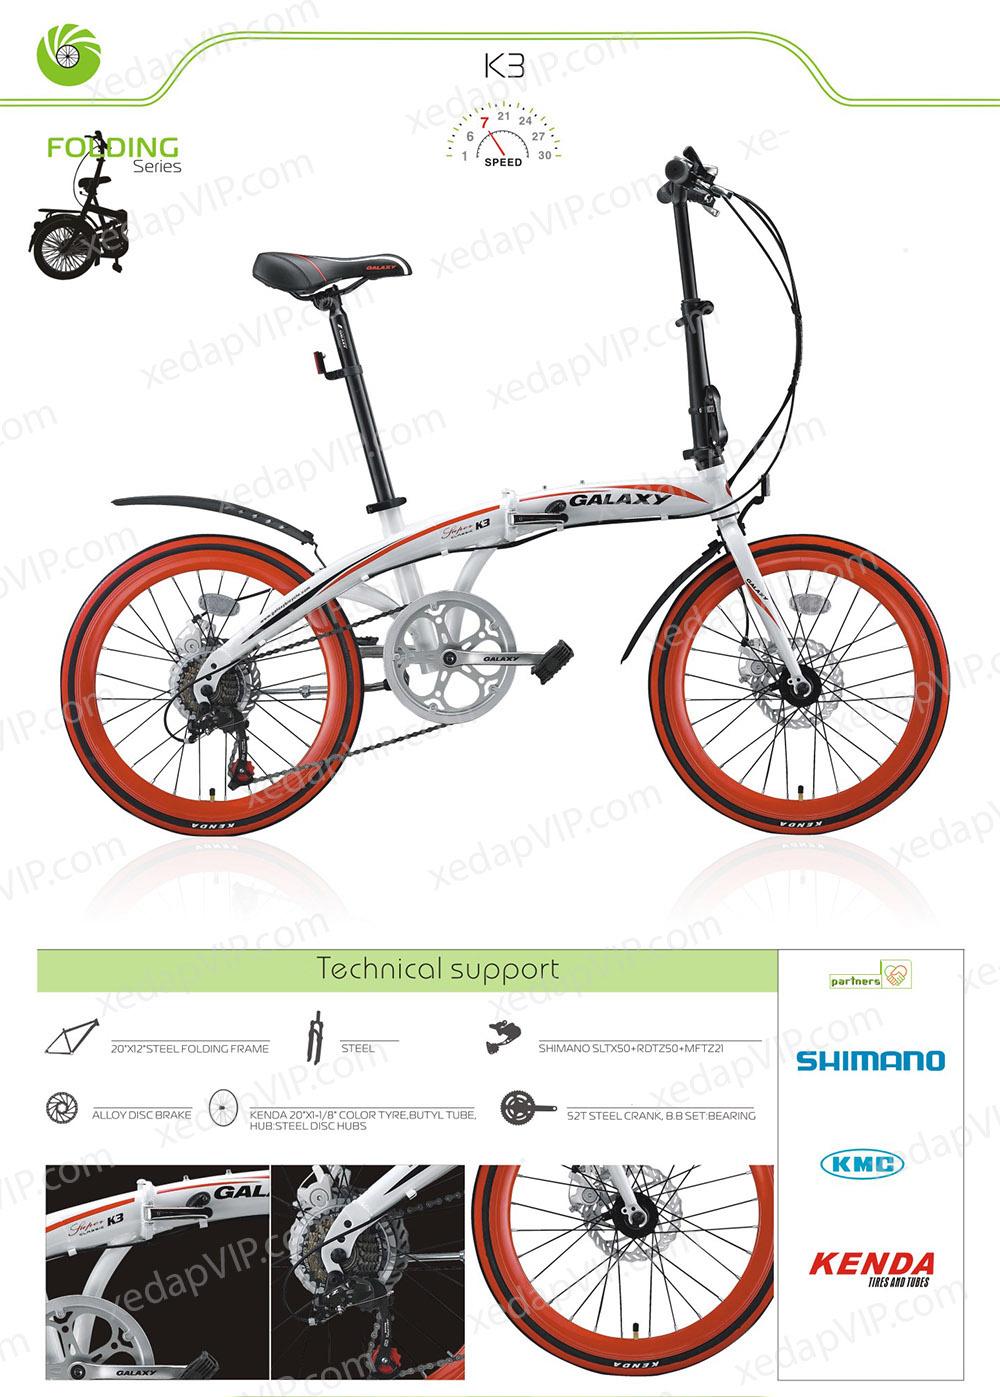 Xe dap the thao Gap GALAXY K3, xe dap the thao, xe dap trinx, xe đạp thể thao chính hãng, xe dap asama, k3